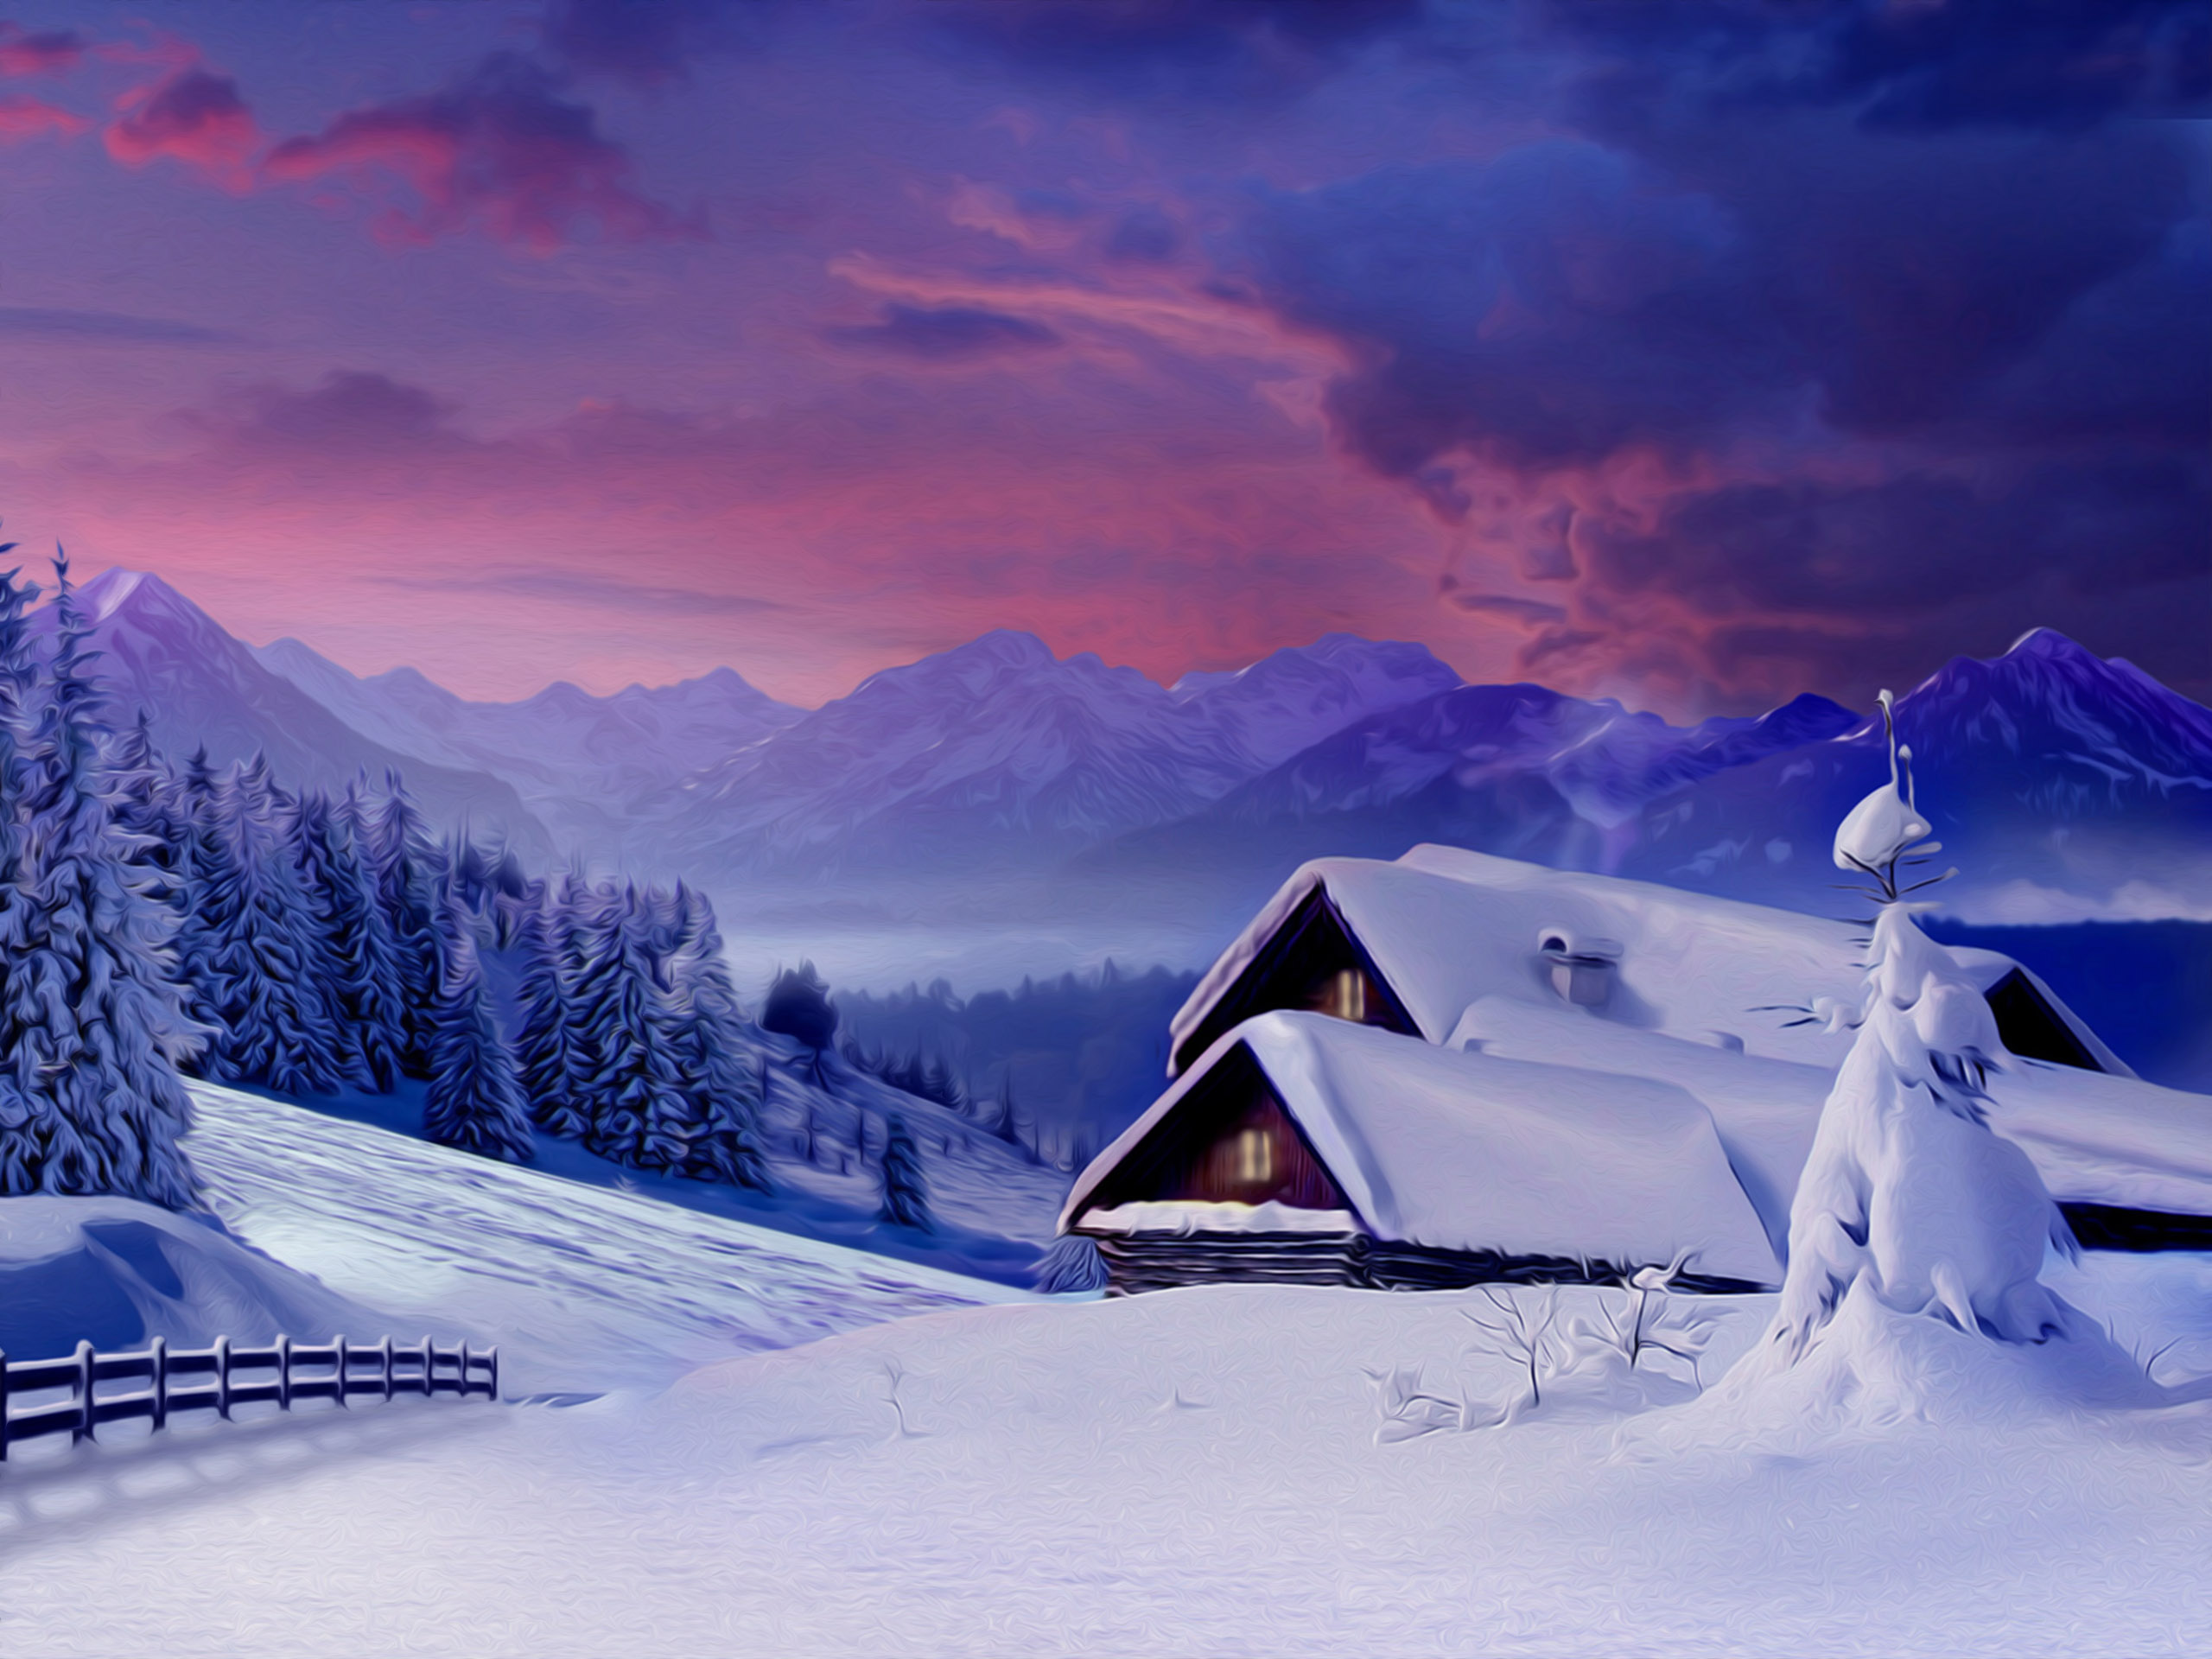 winter nature snow scene free desktop wallpapers for